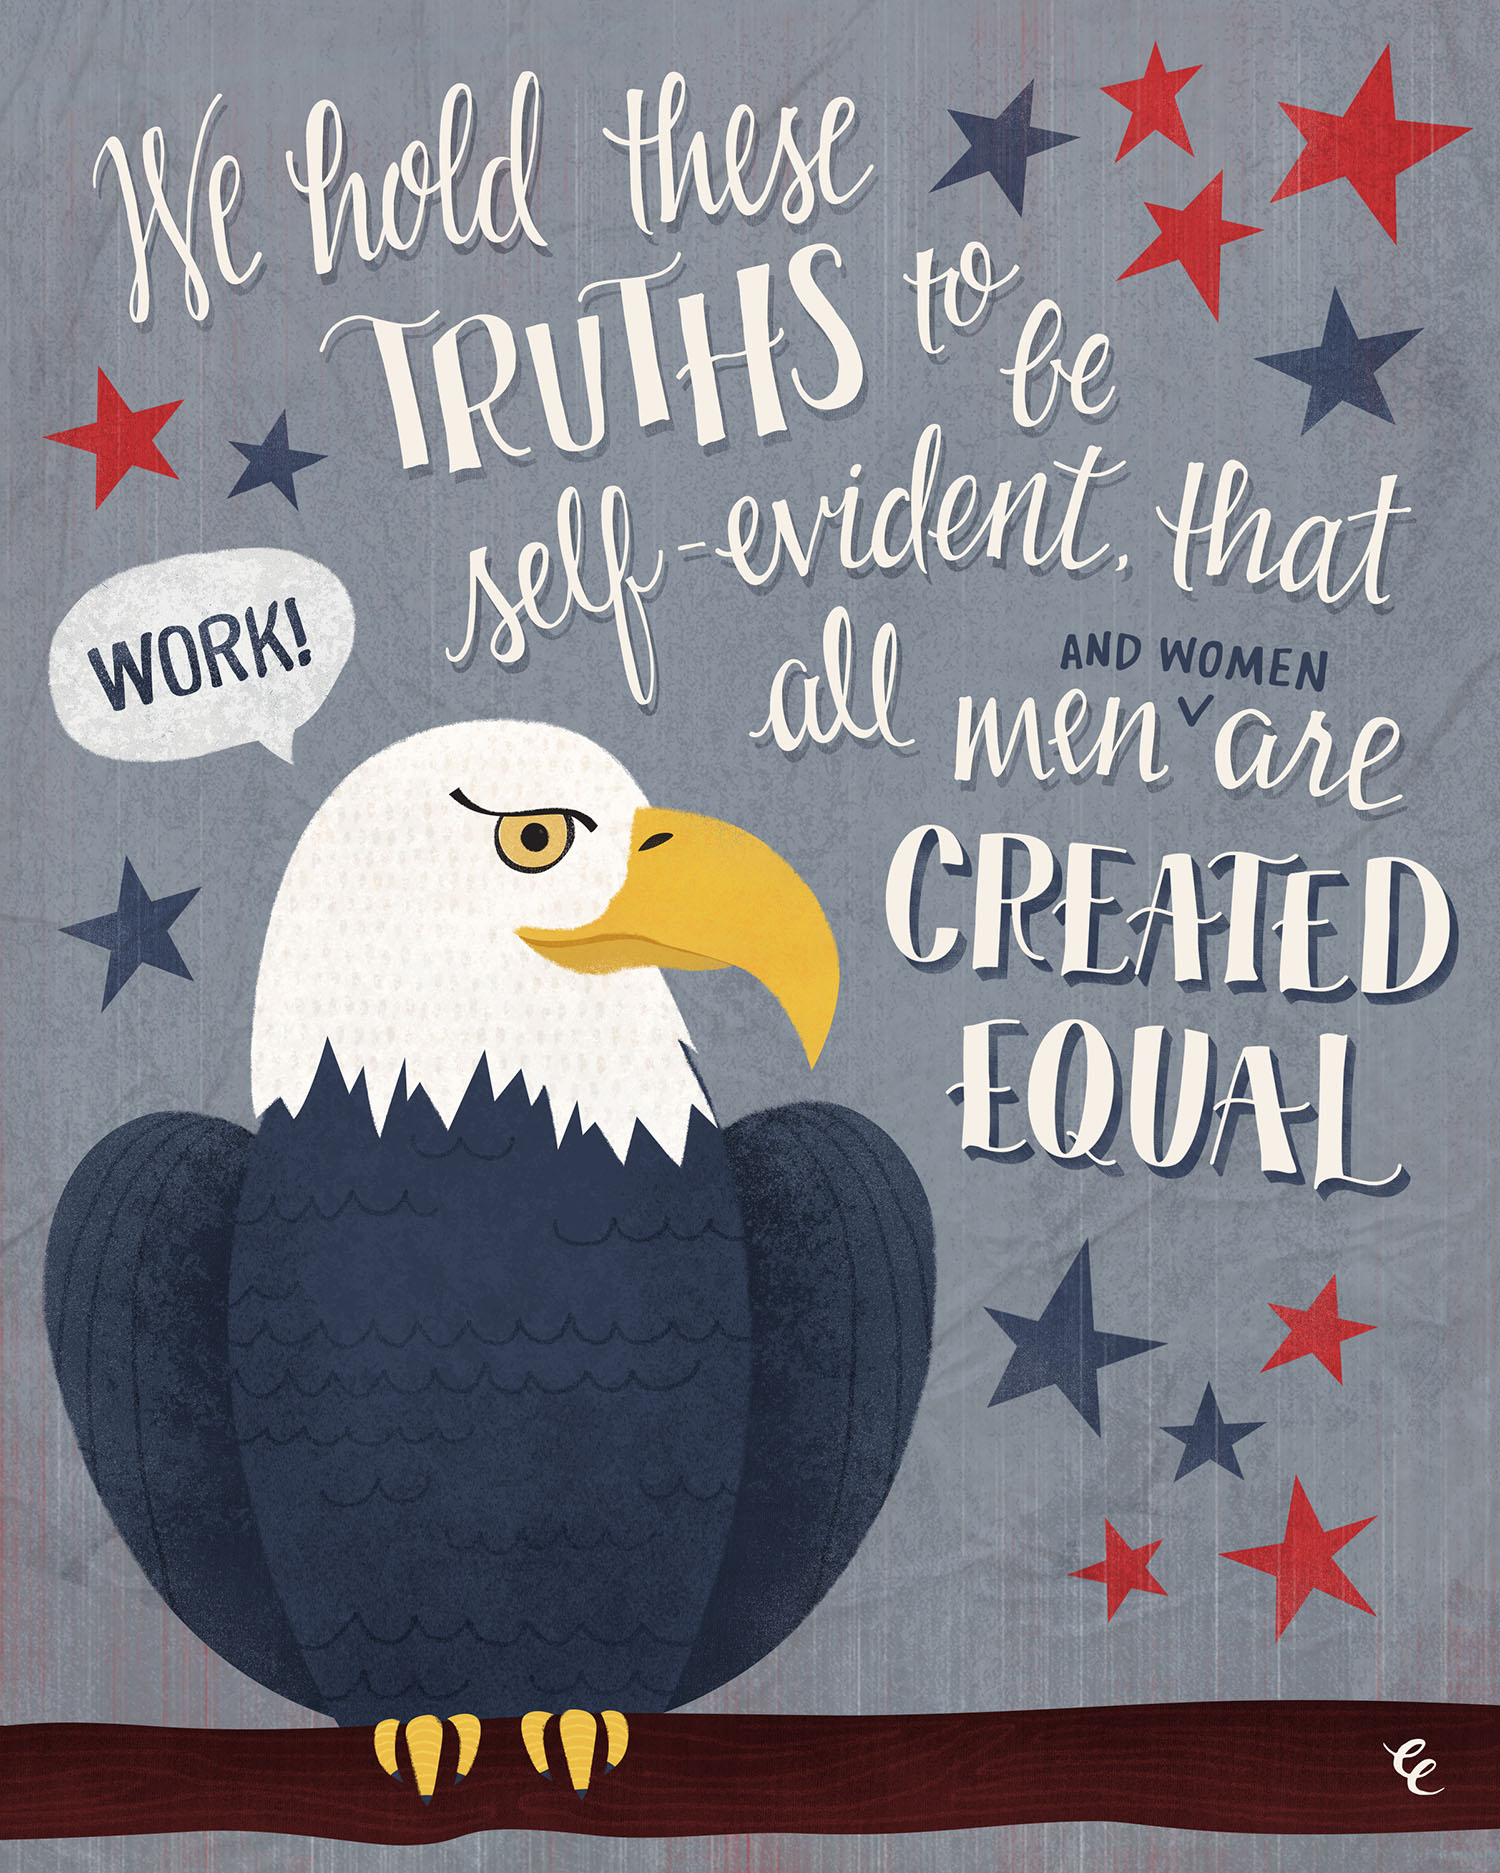 WEEK 26:  an Equitable Eagle